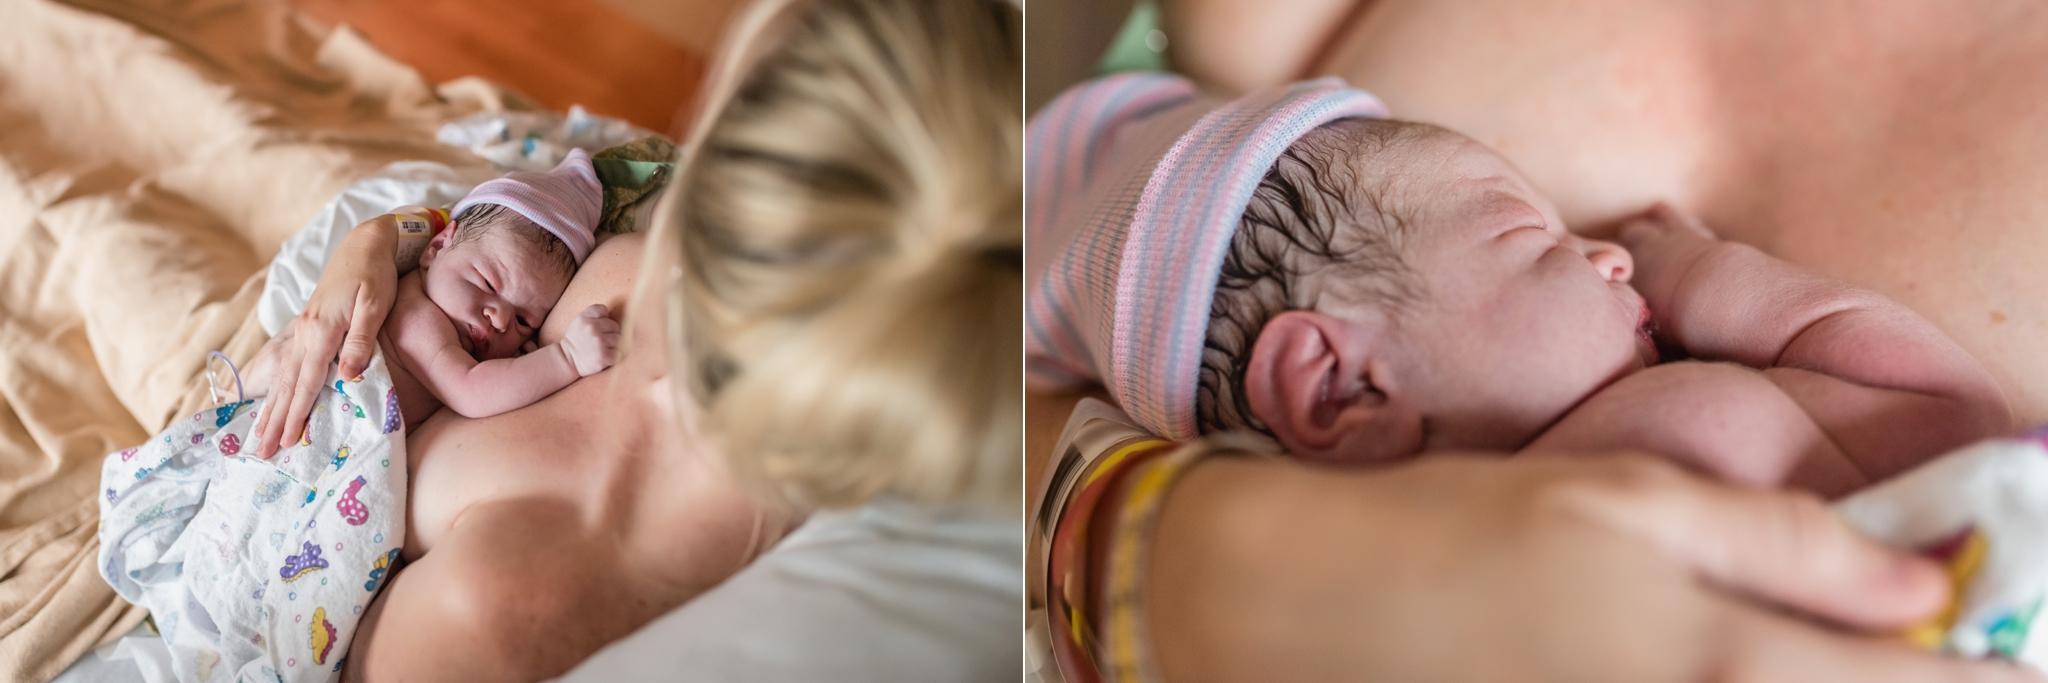 childbirth imagery